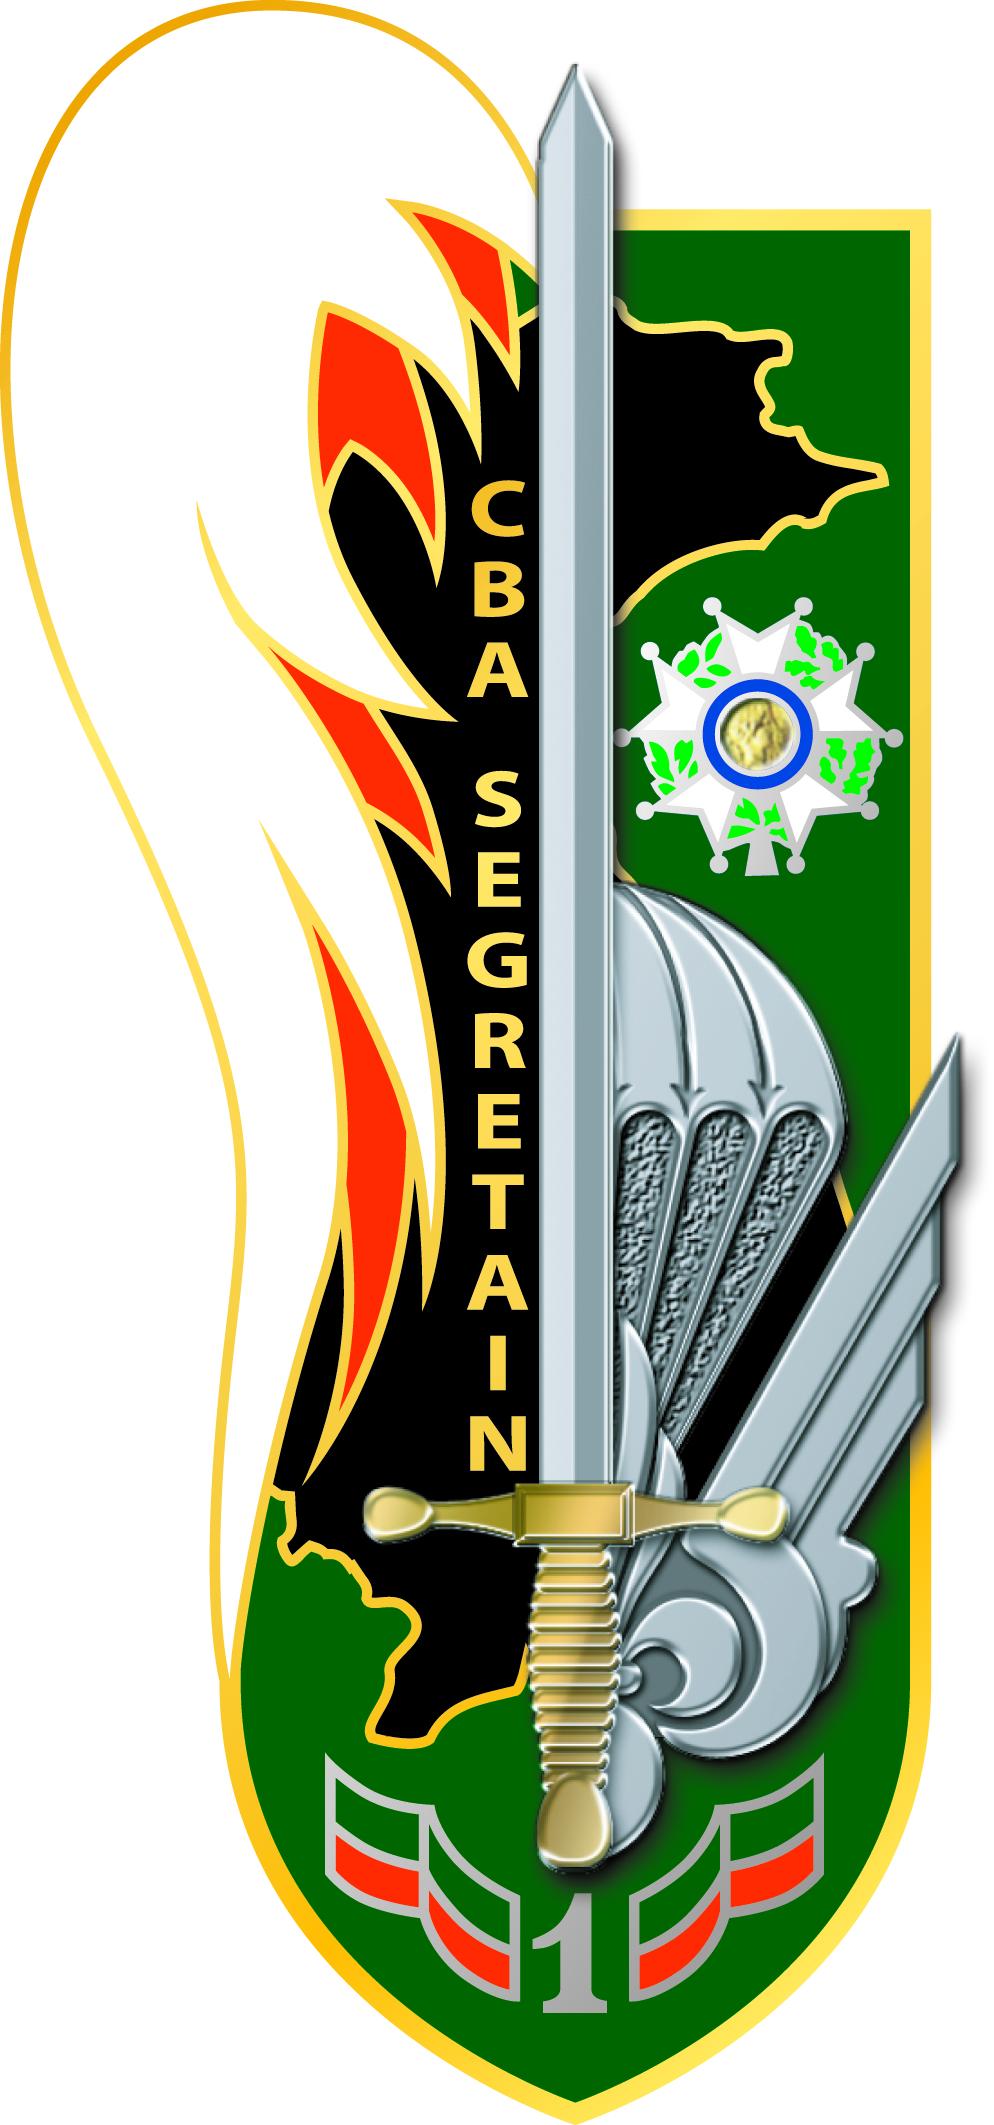 Insigne CBA Segrétain